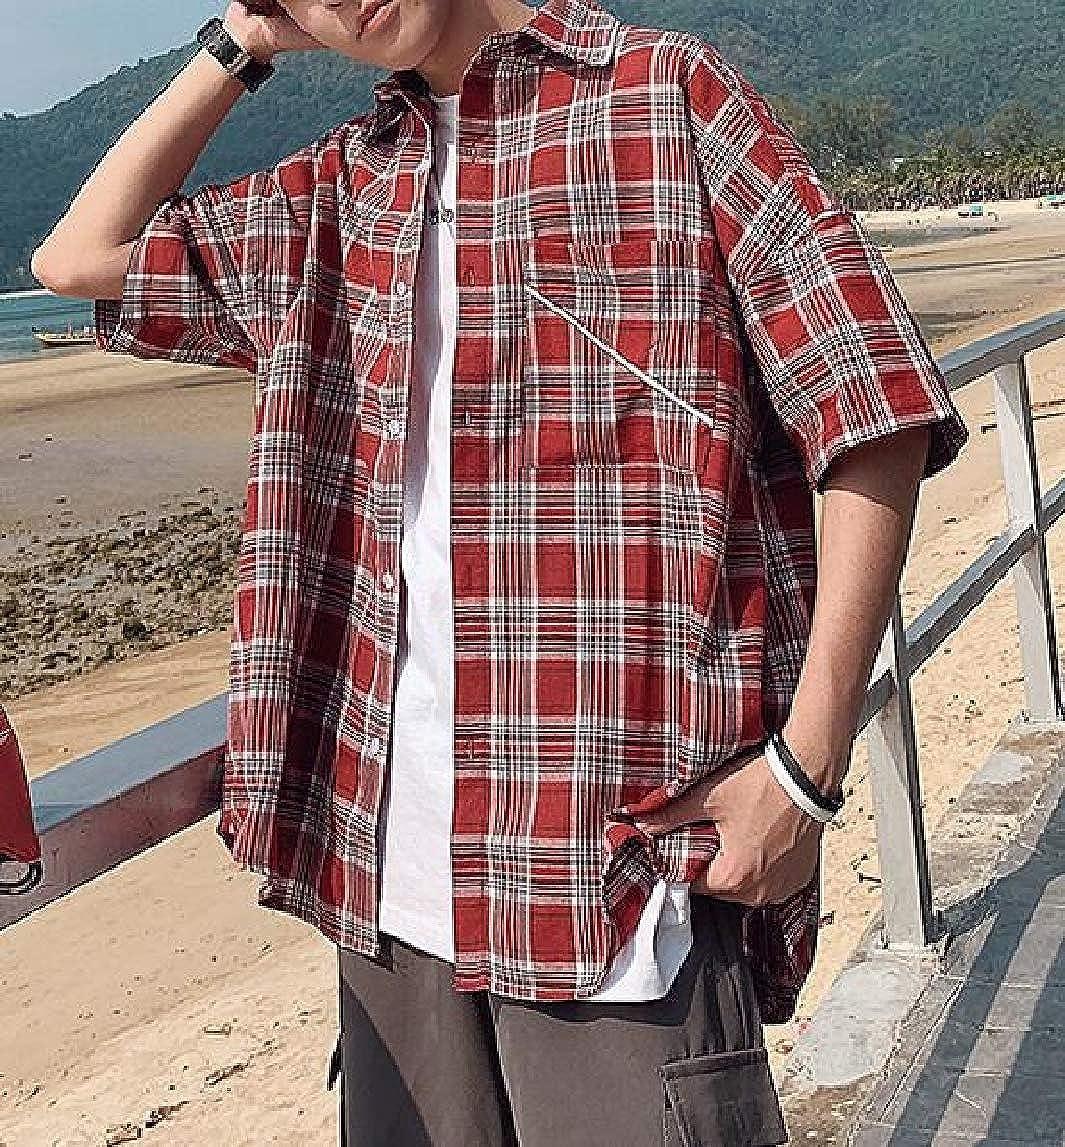 Jmwss QD Mens Plaid Shirts Lapel Short Sleeve Button Down Shirt Loose Fit Shirt